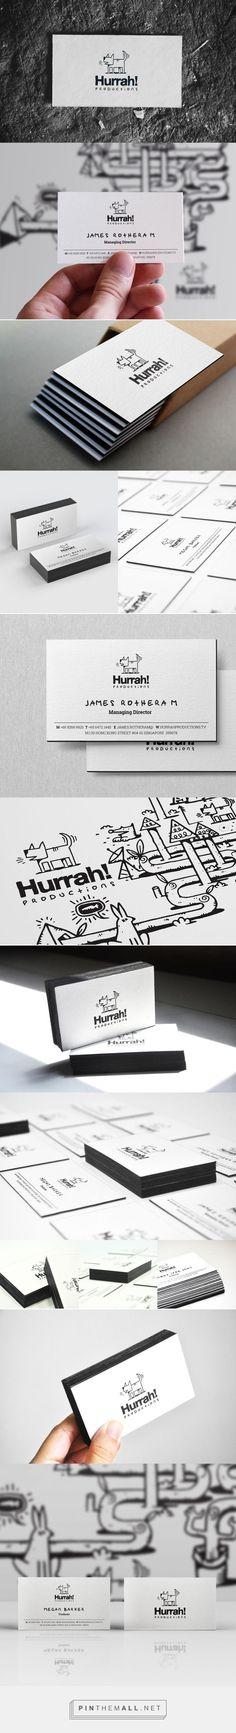 Hurrah! letterpress black edge business card design BY Rayz Ong: